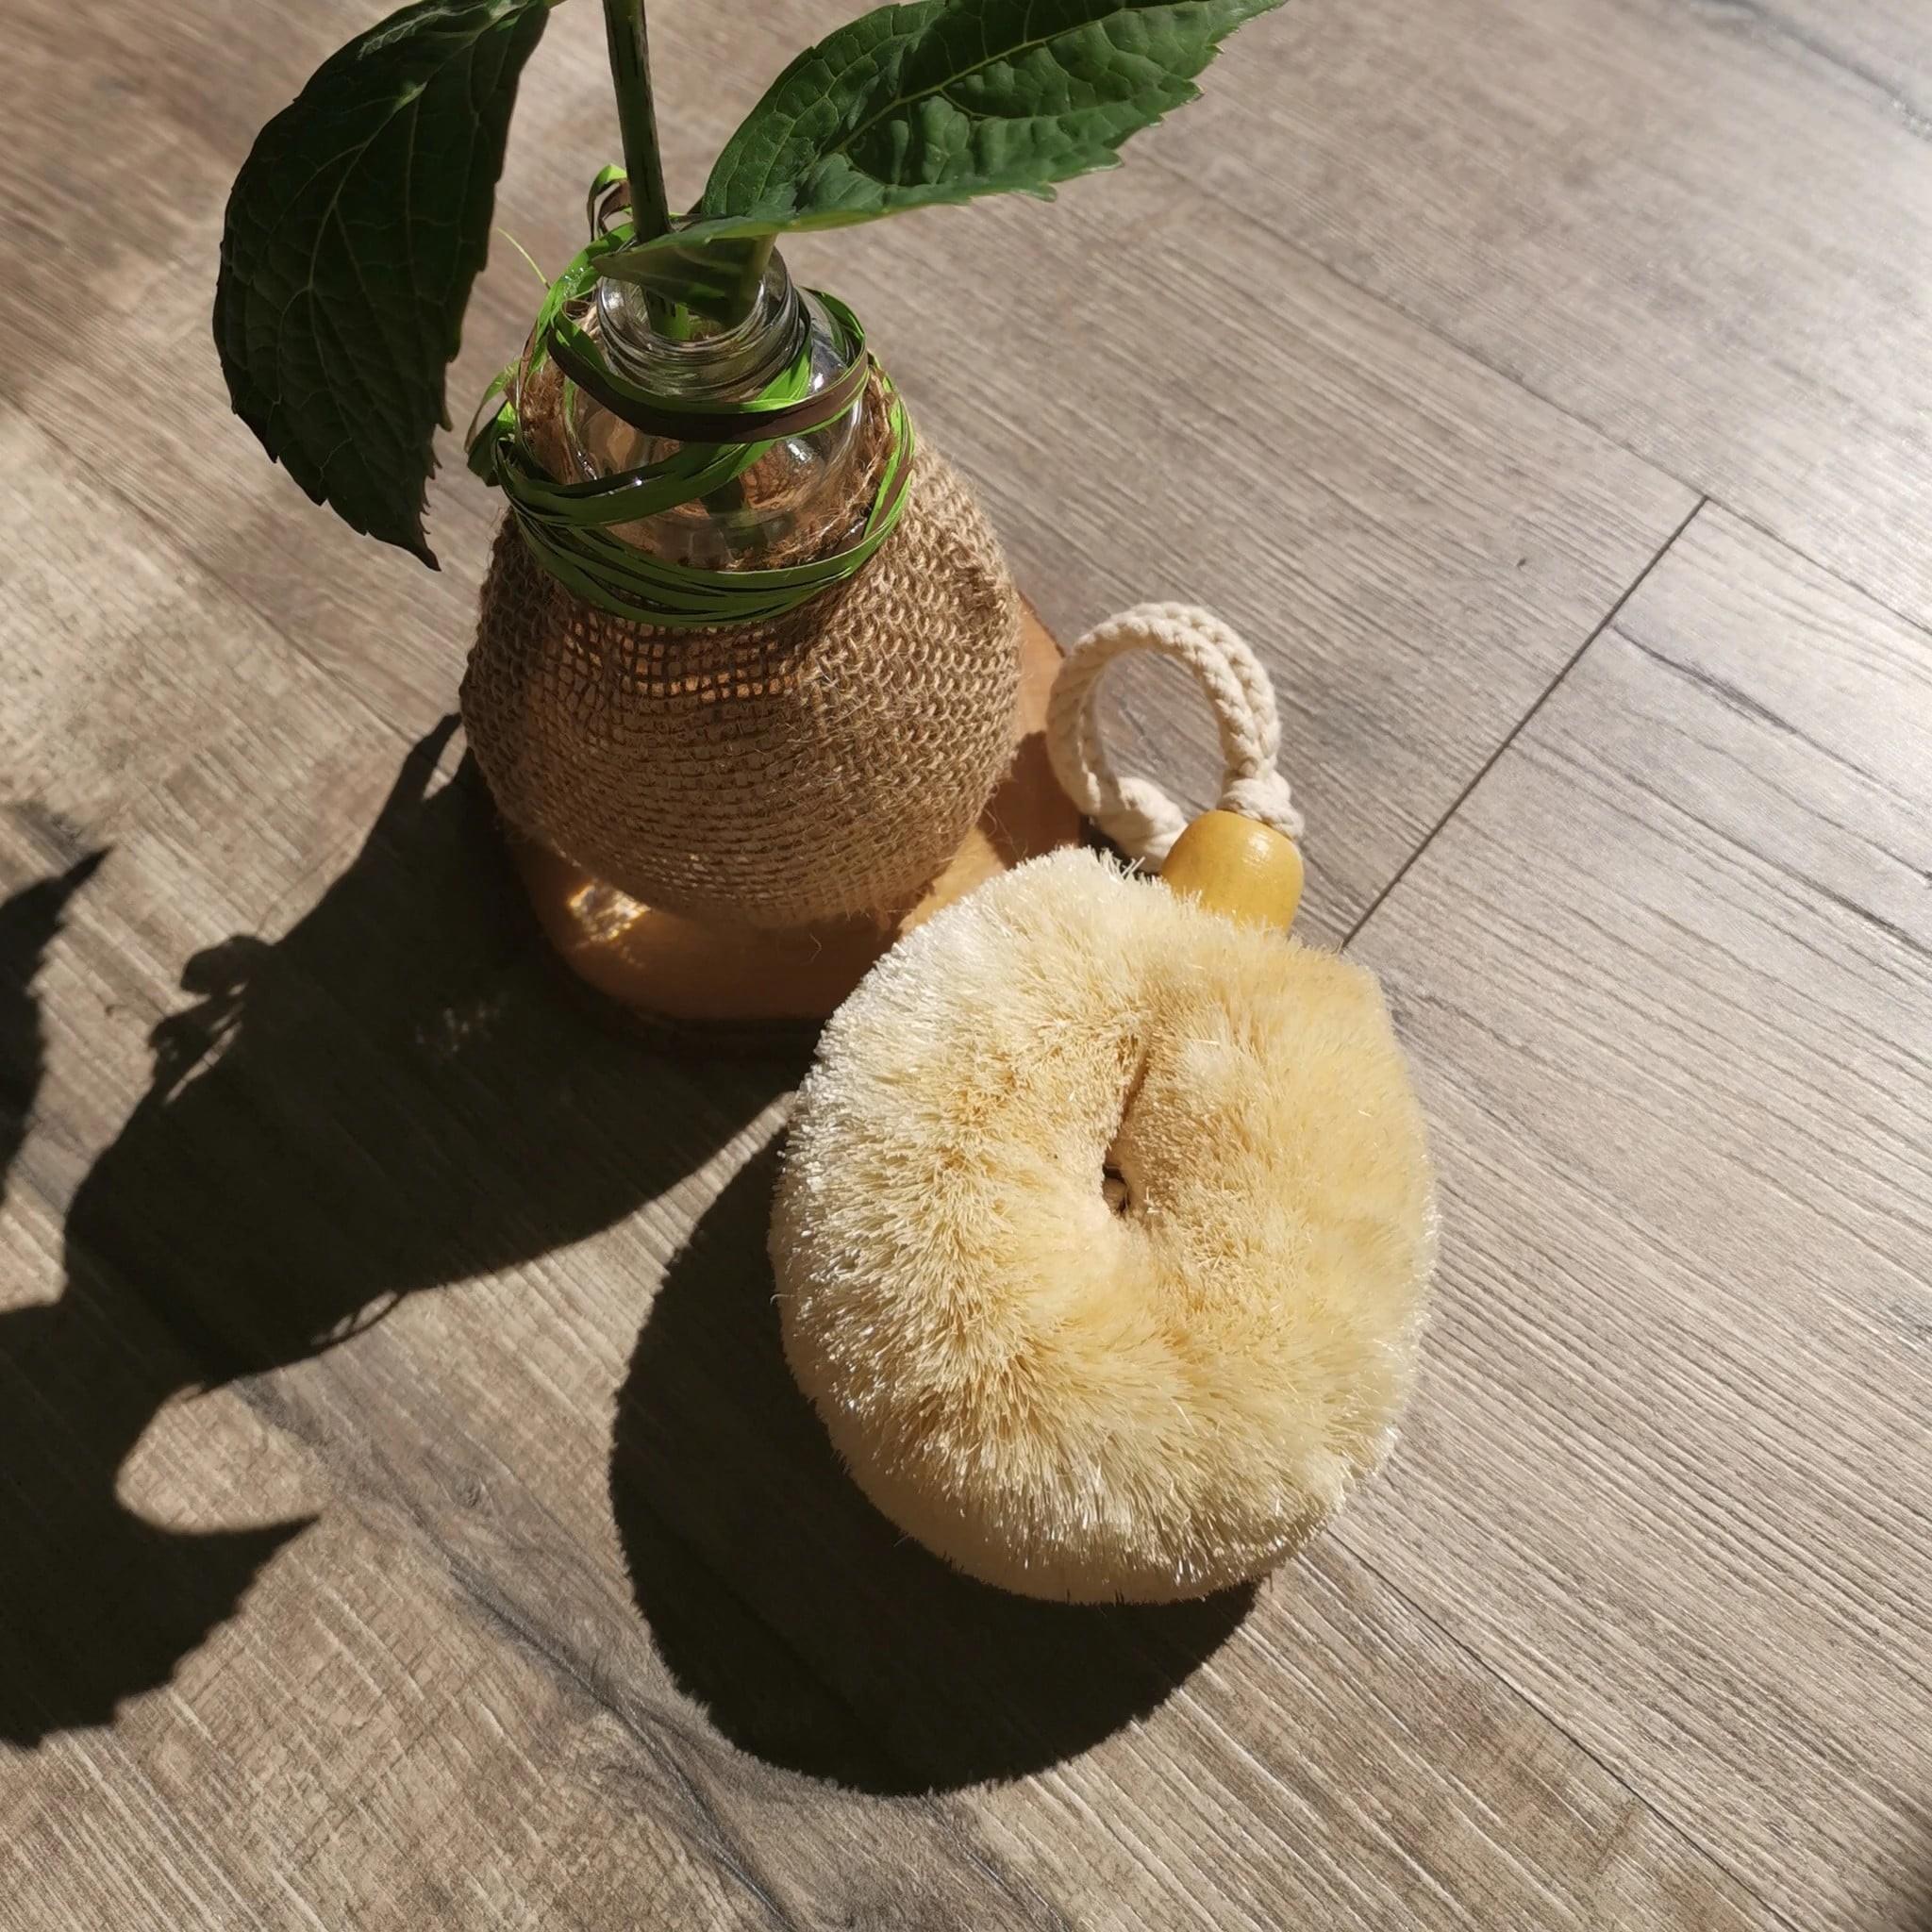 ELYTRUM Palm Size Body Brush.